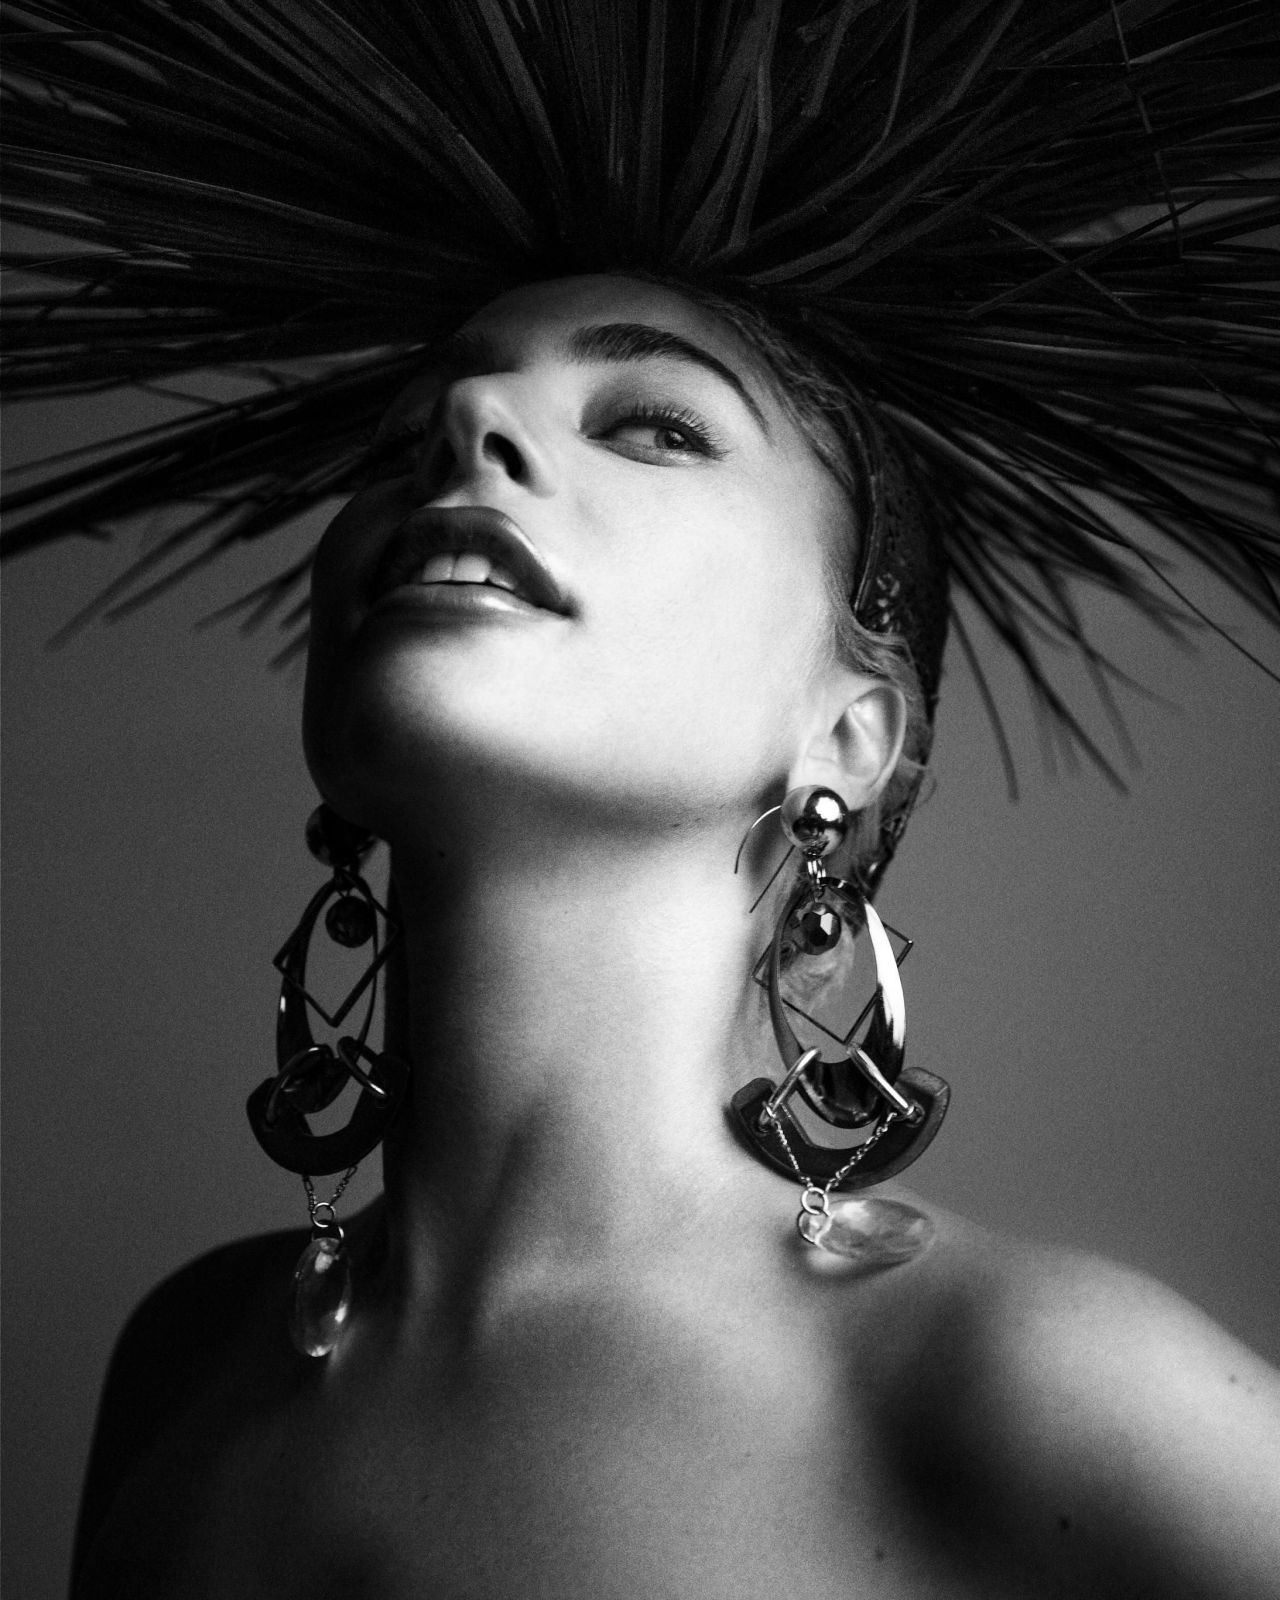 https://celebmafia.com/wp-content/uploads/2018/11/lady-gaga-photoshoot-for-enigma-2018-2.jpg